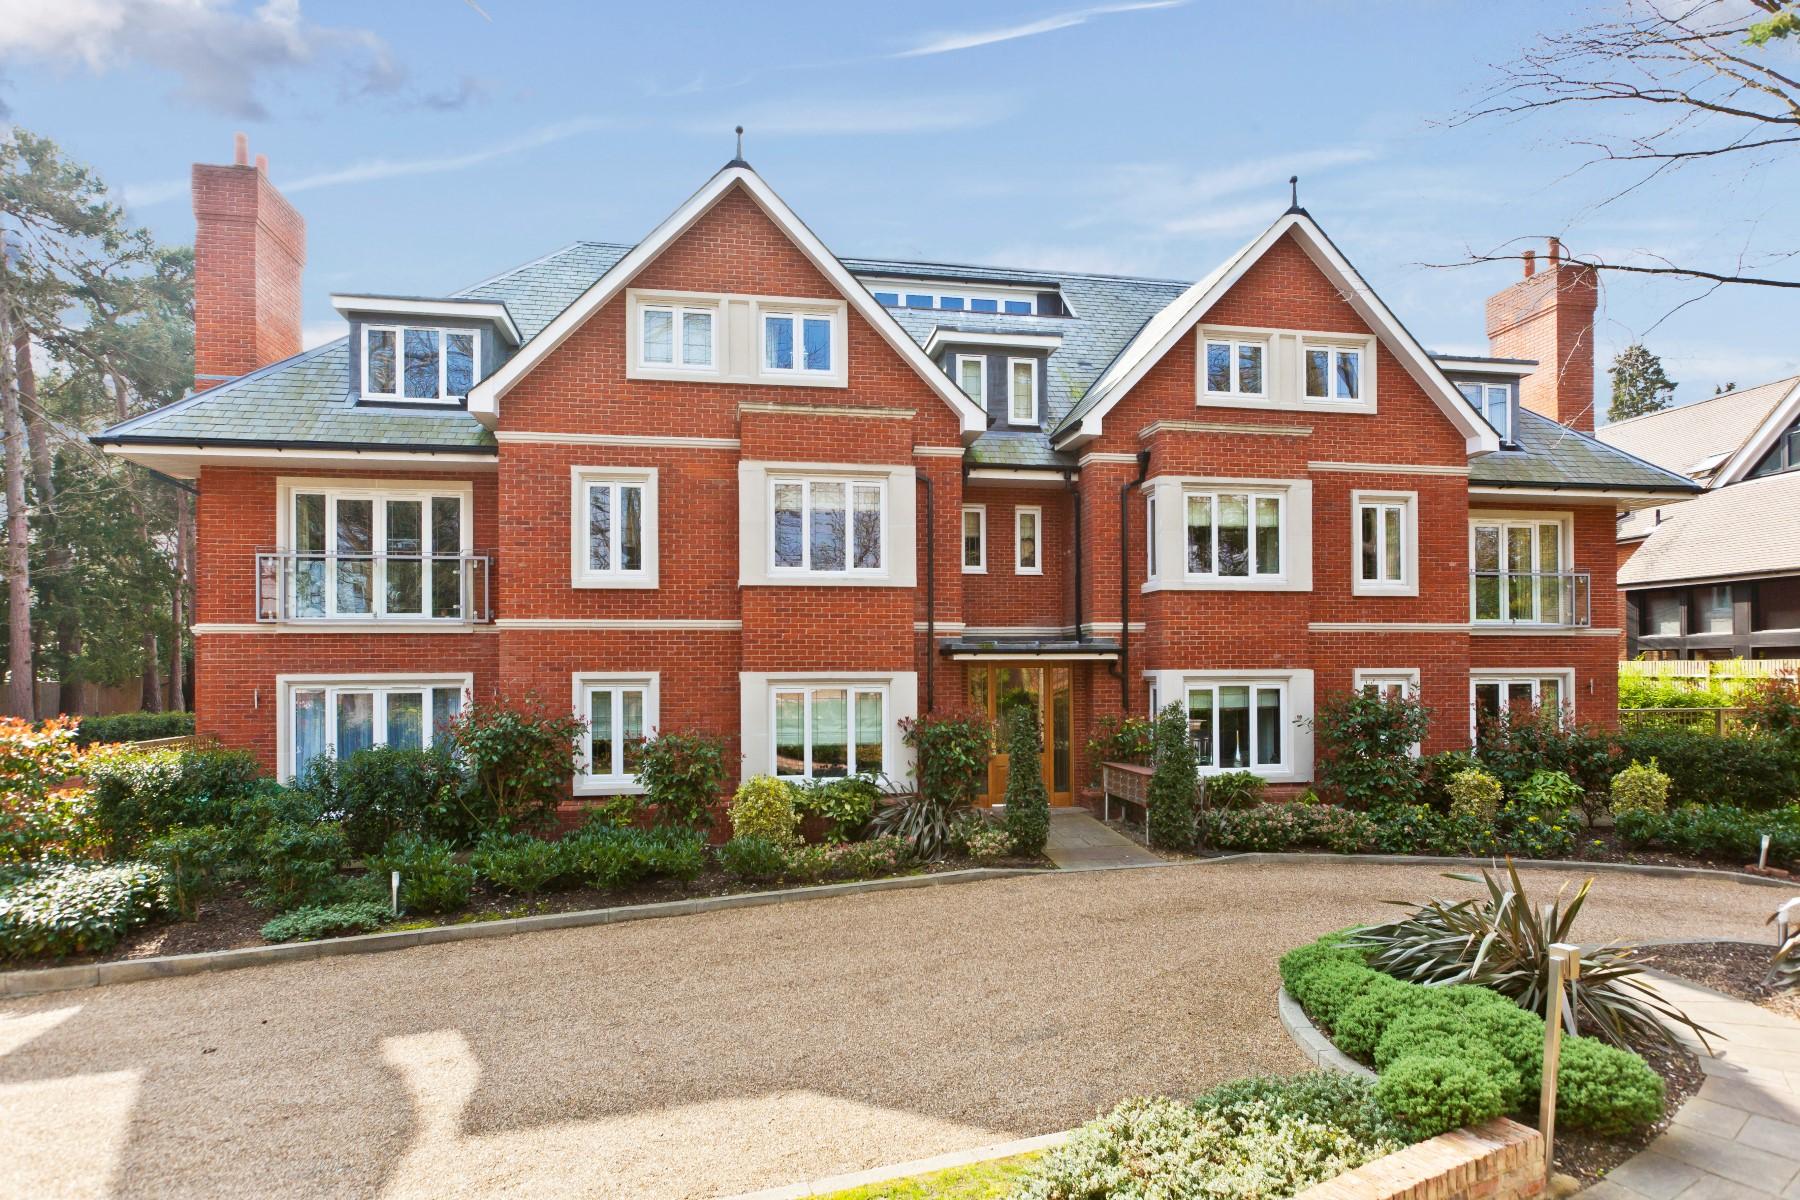 sales property at Weybridge, Surrey